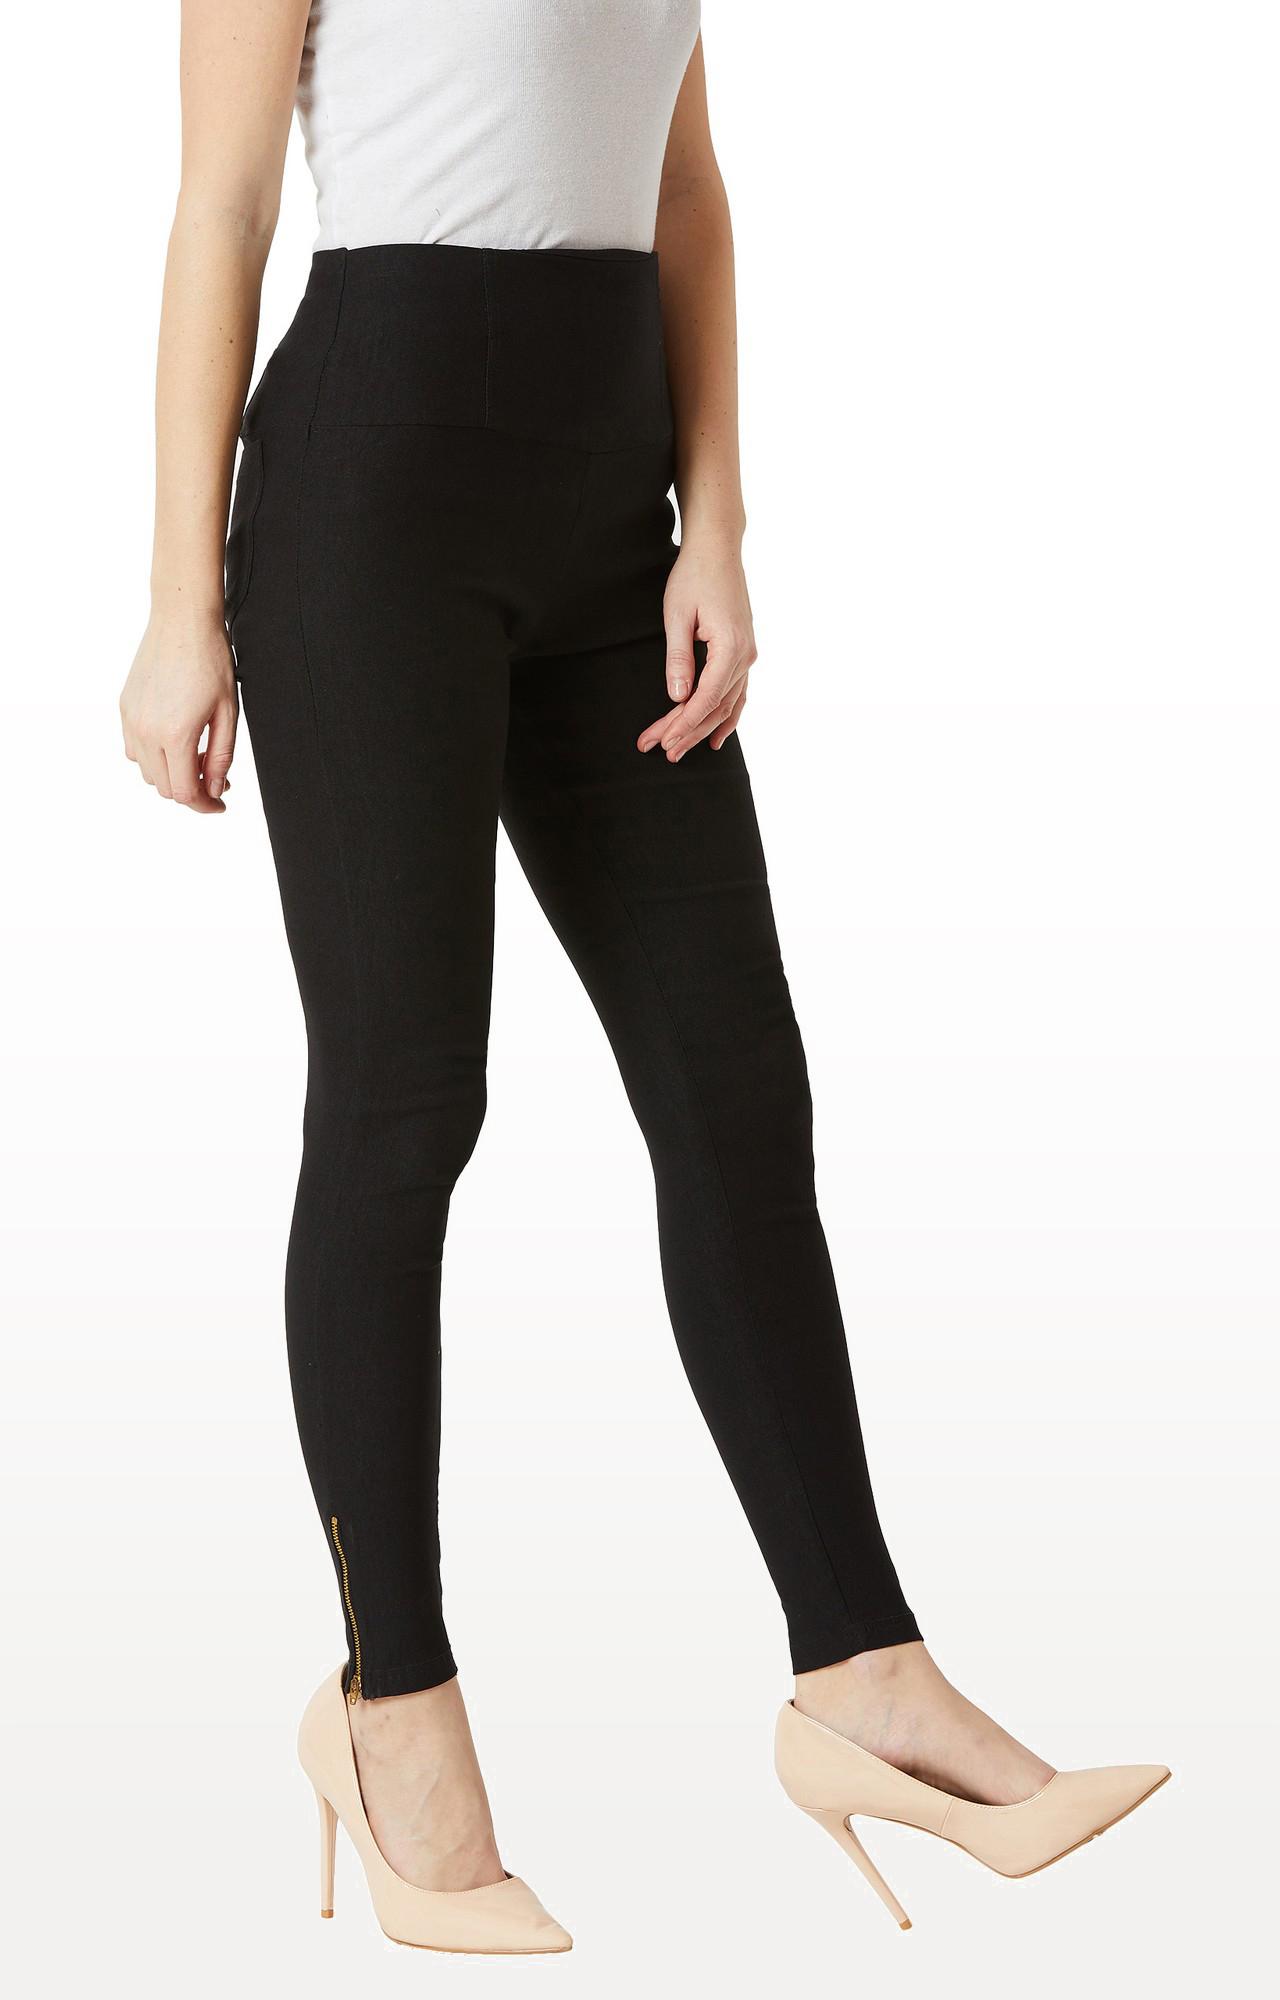 MISS CHASE   Black Solid High Waist Patch Pocket Zipper Detailing Regular Length Jeggings